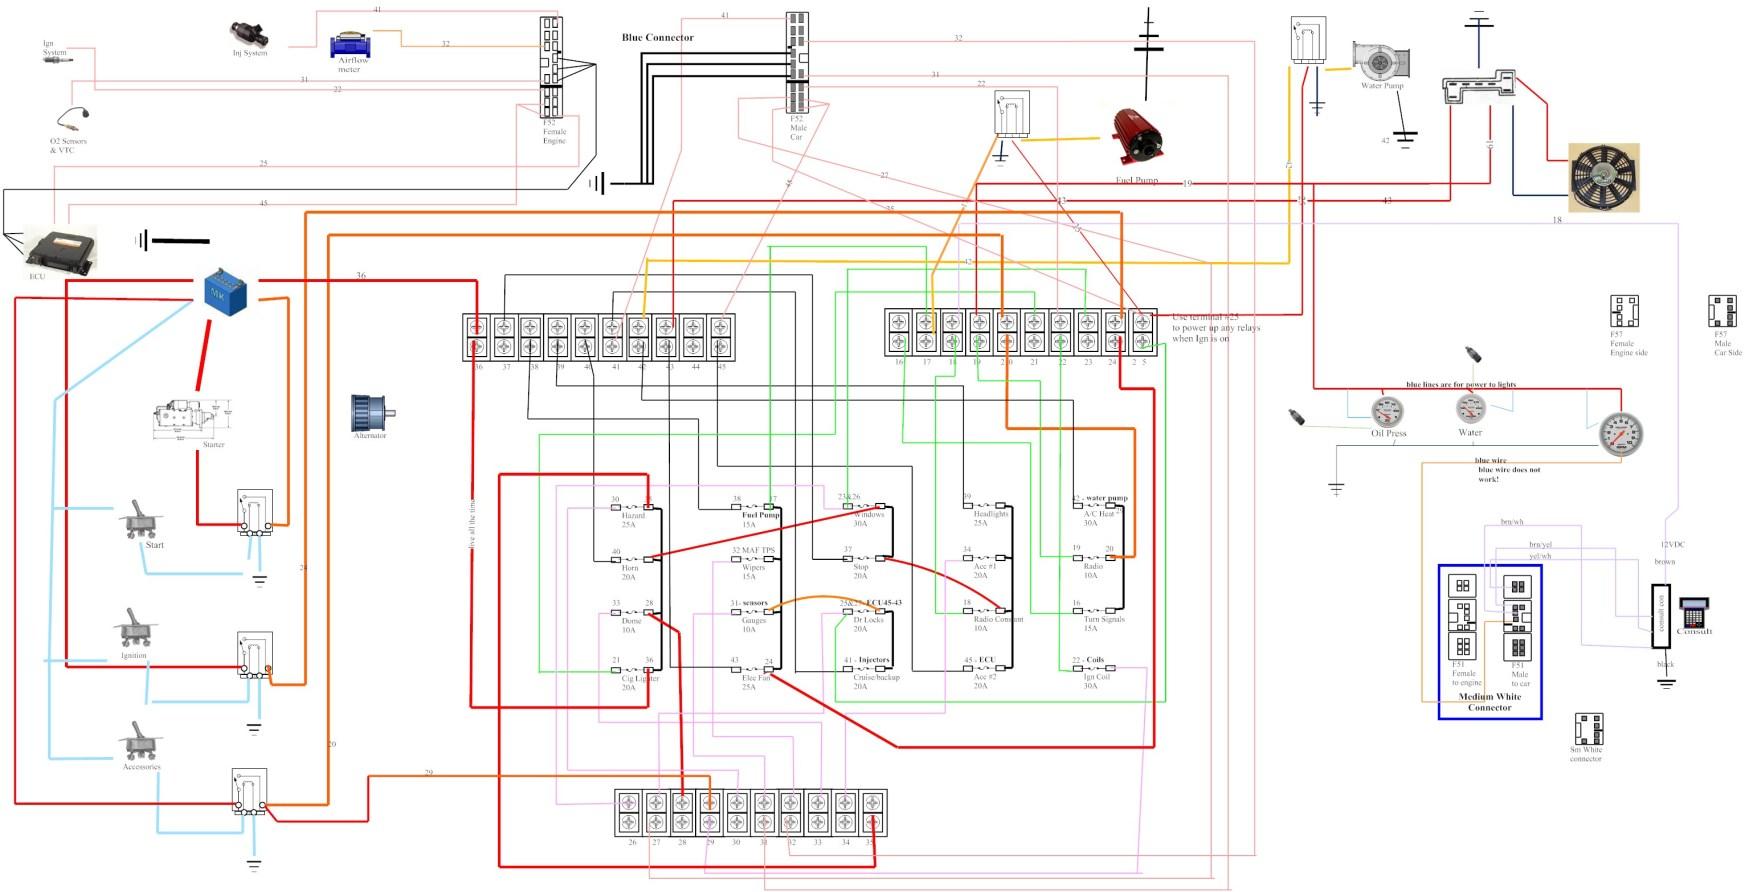 s15 sr20de wiring diagram wiring diagrams sr20 wiring diagram auto schematic